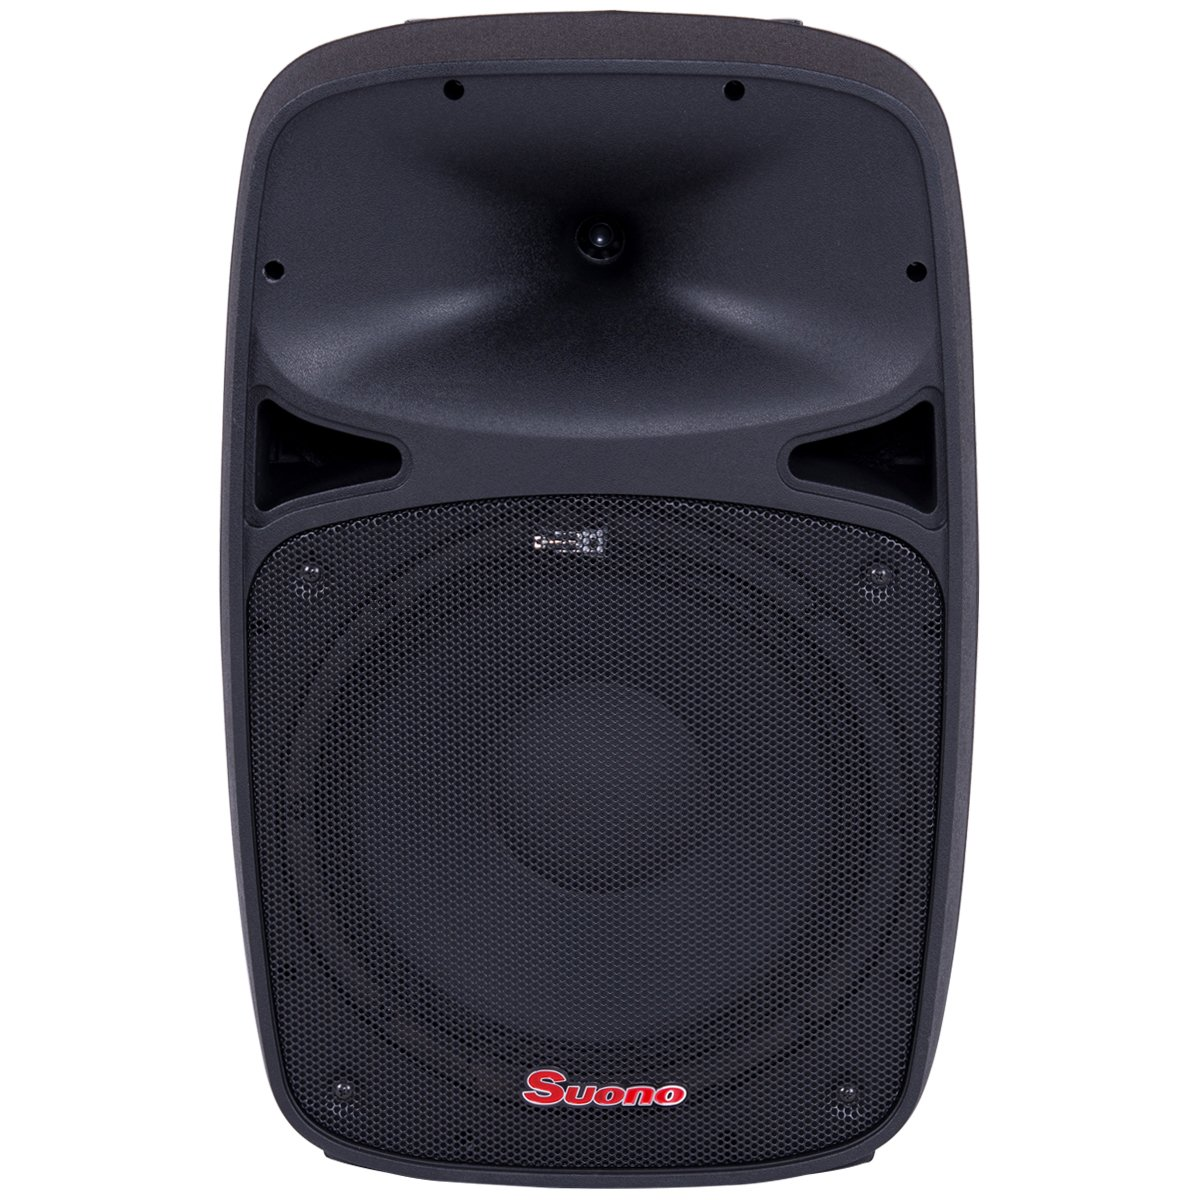 Suono Powered Speaker, 2-Way Portable Professional DJ PA Speaker with Remote Control (15'' 1000W)